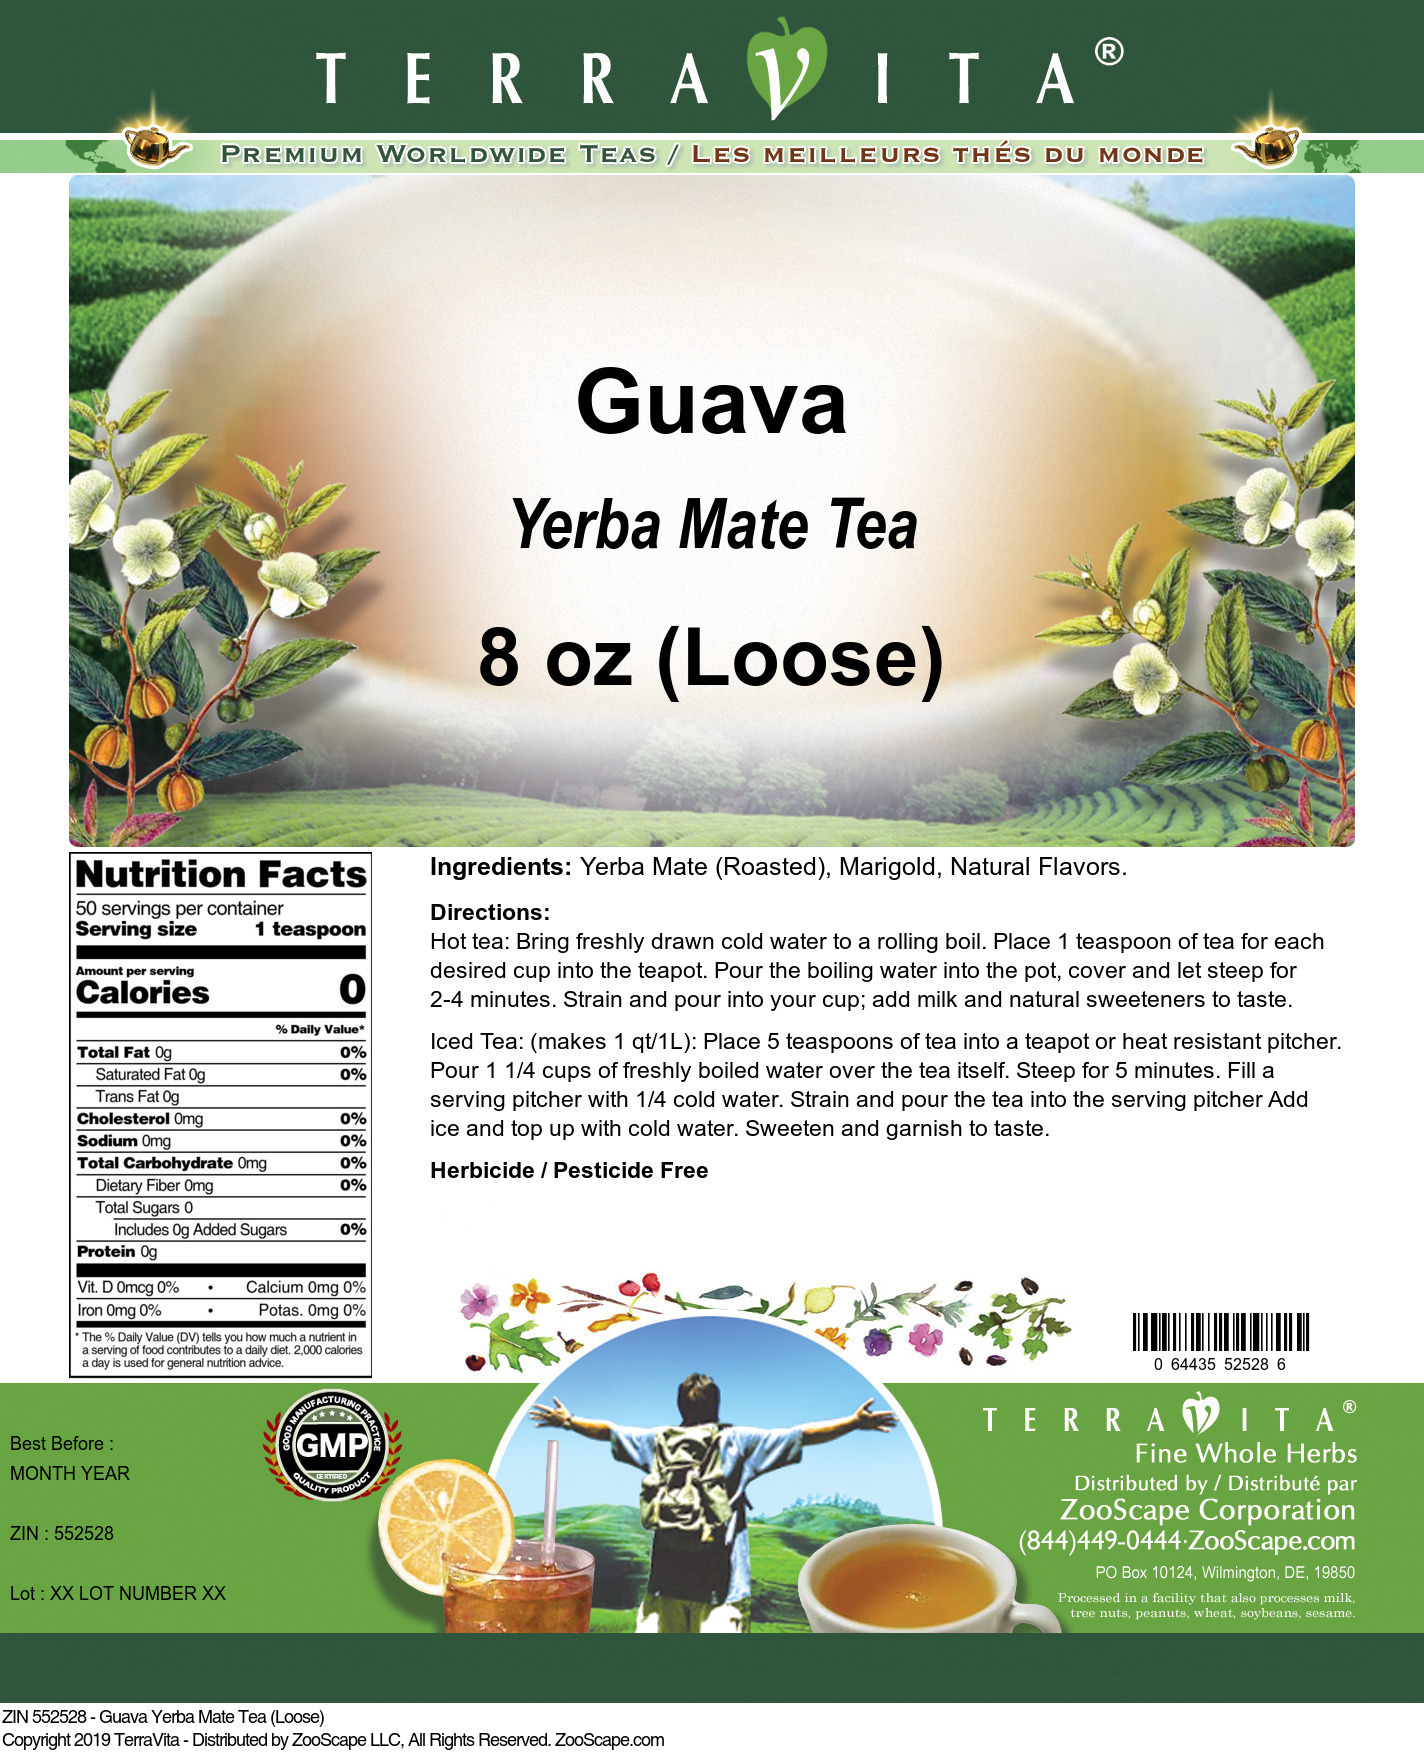 Guava Yerba Mate